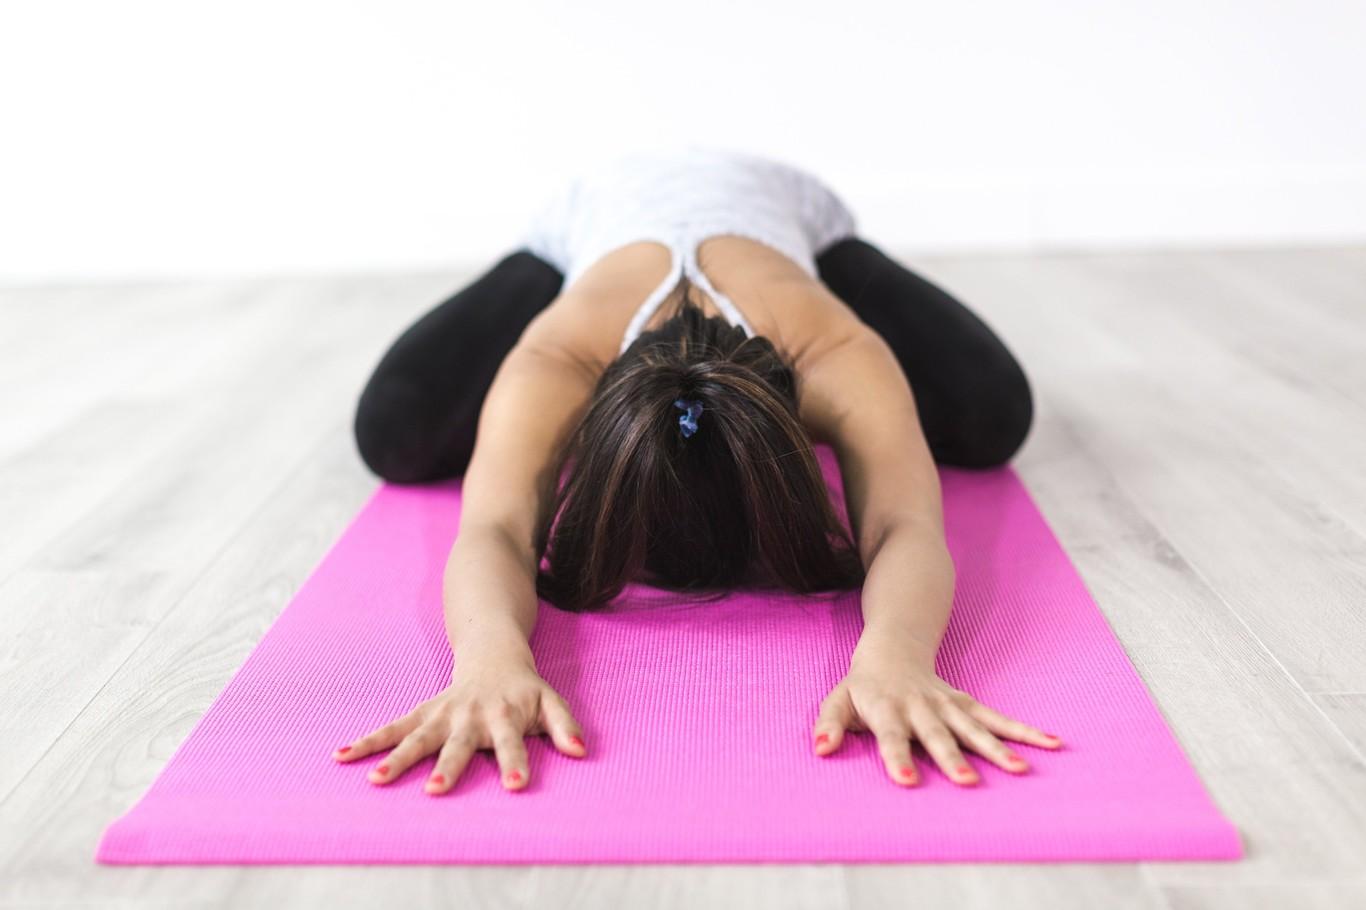 que es mejor pilates o yoga para bajar de peso